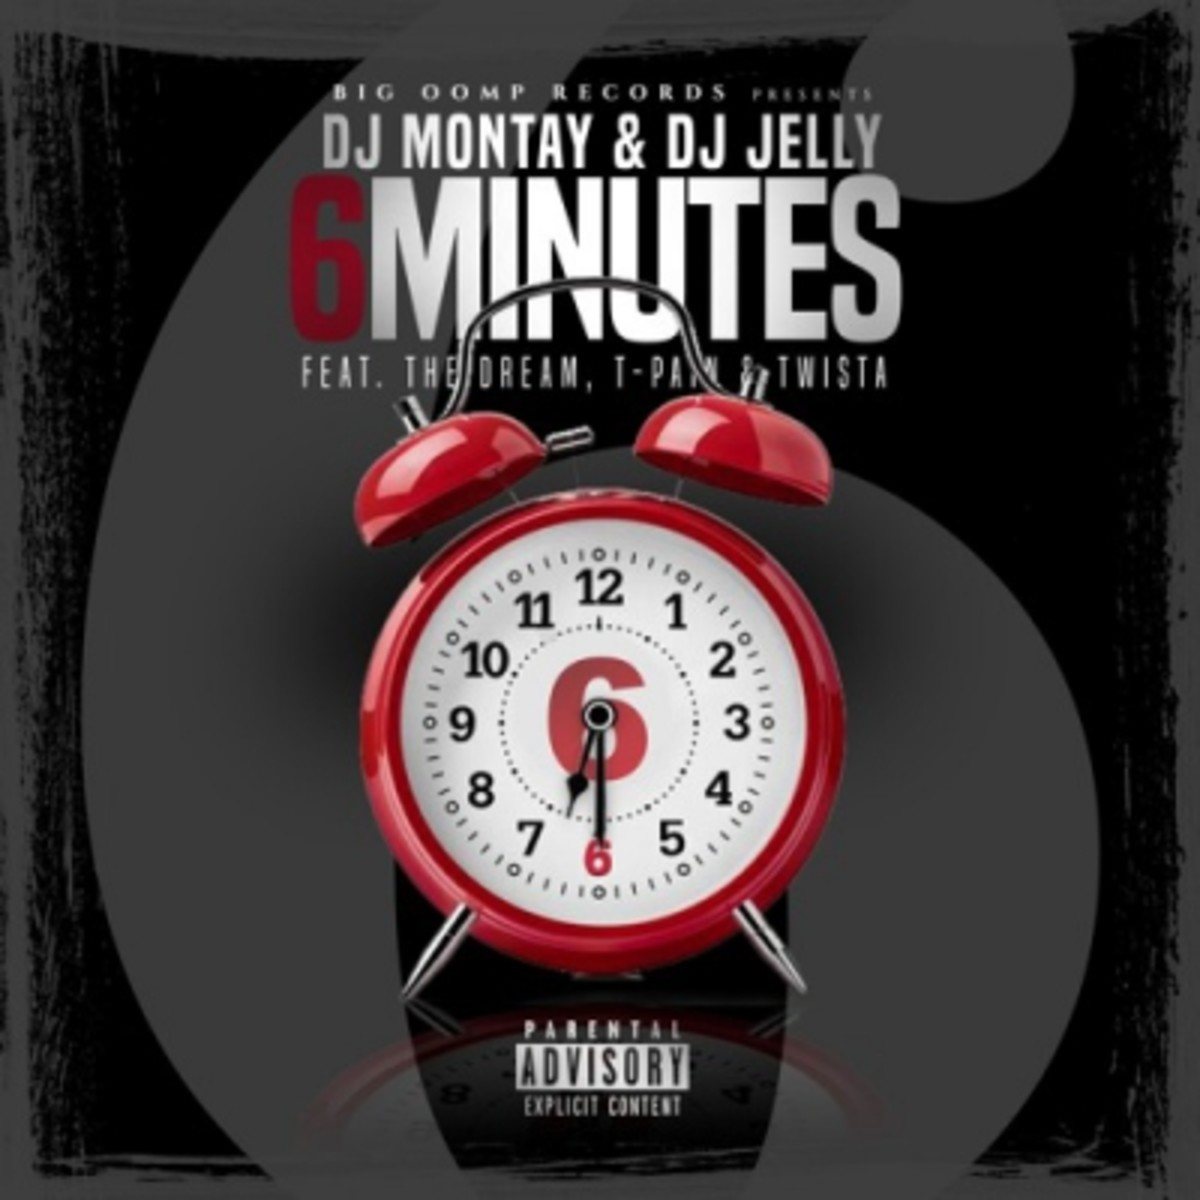 dj-montay-dj-jelly-6-minutes.jpg